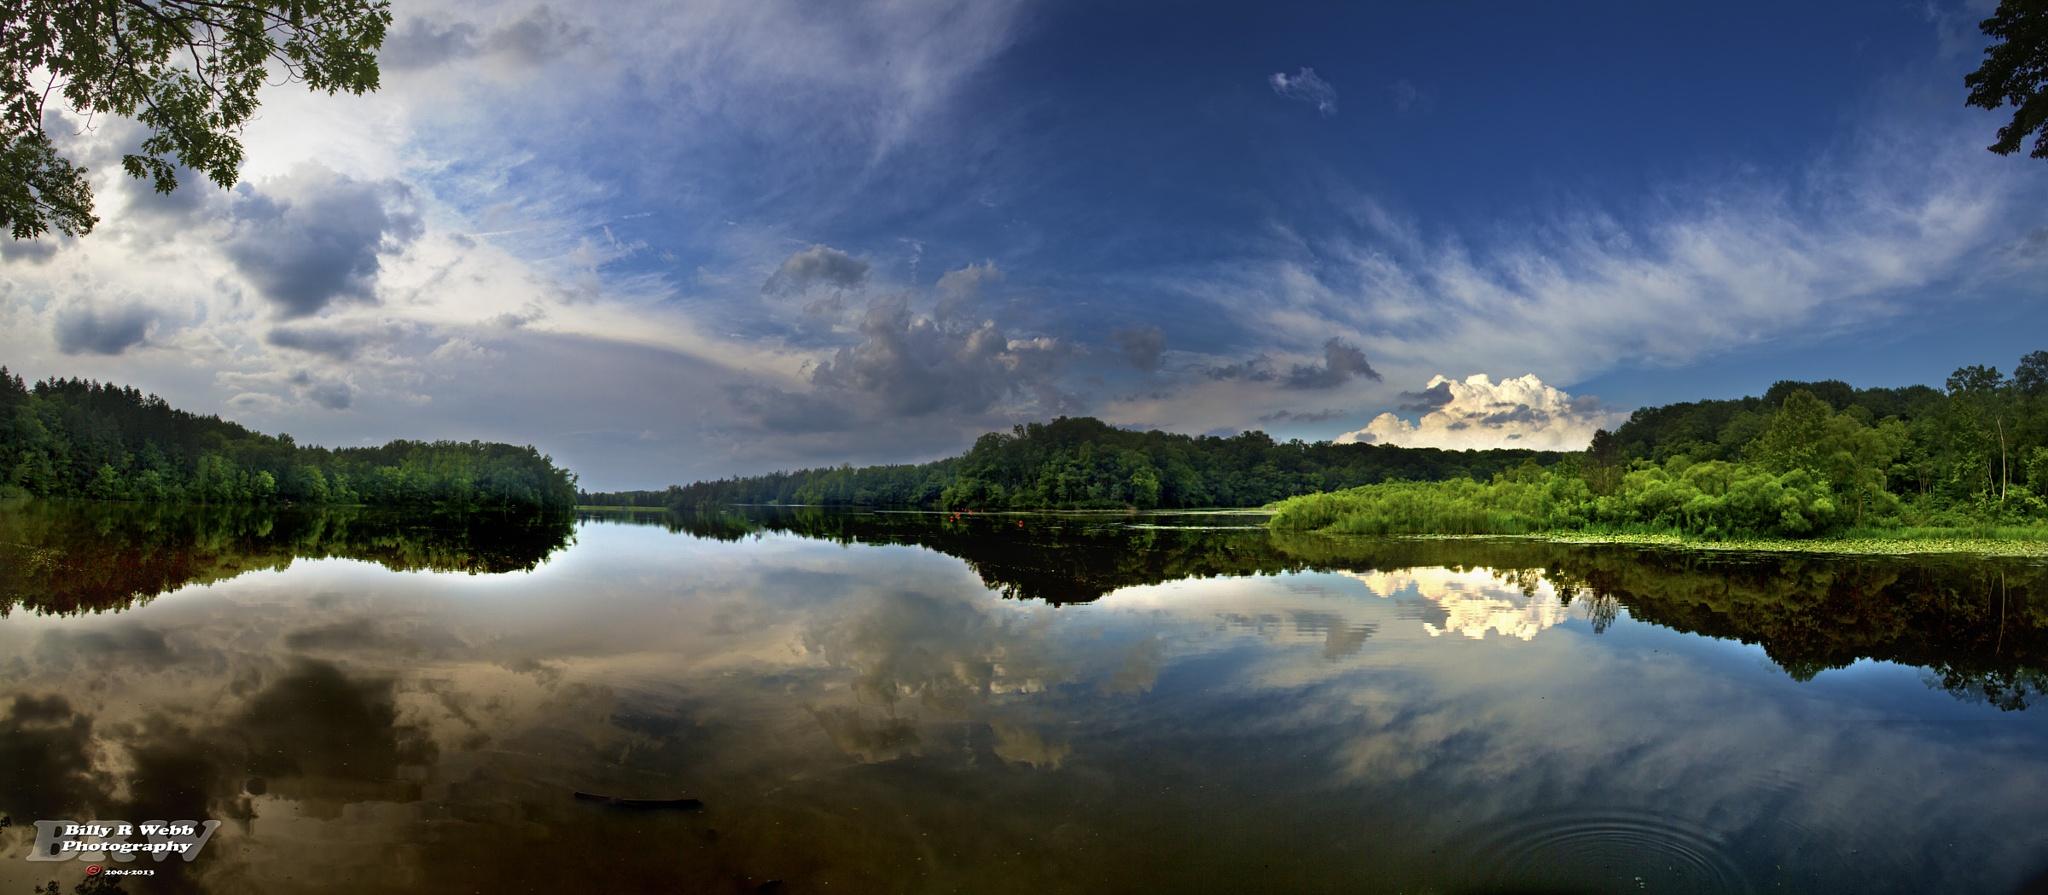 5 shot vertical panorama by BillyWebb